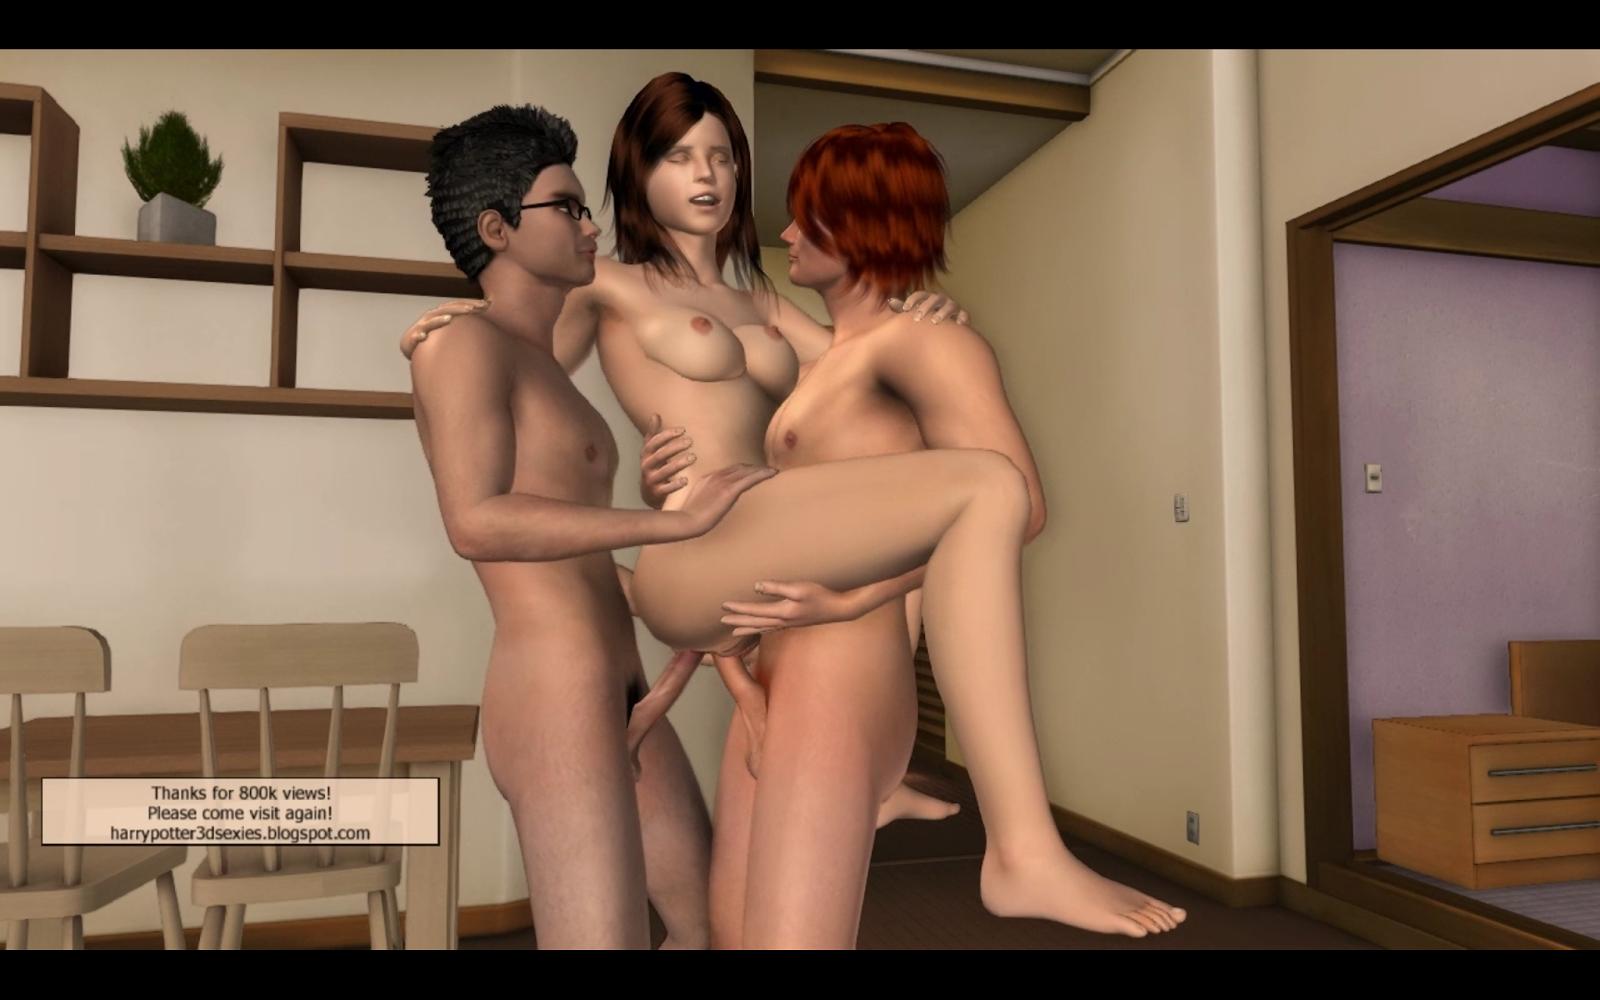 hermione stories erotica